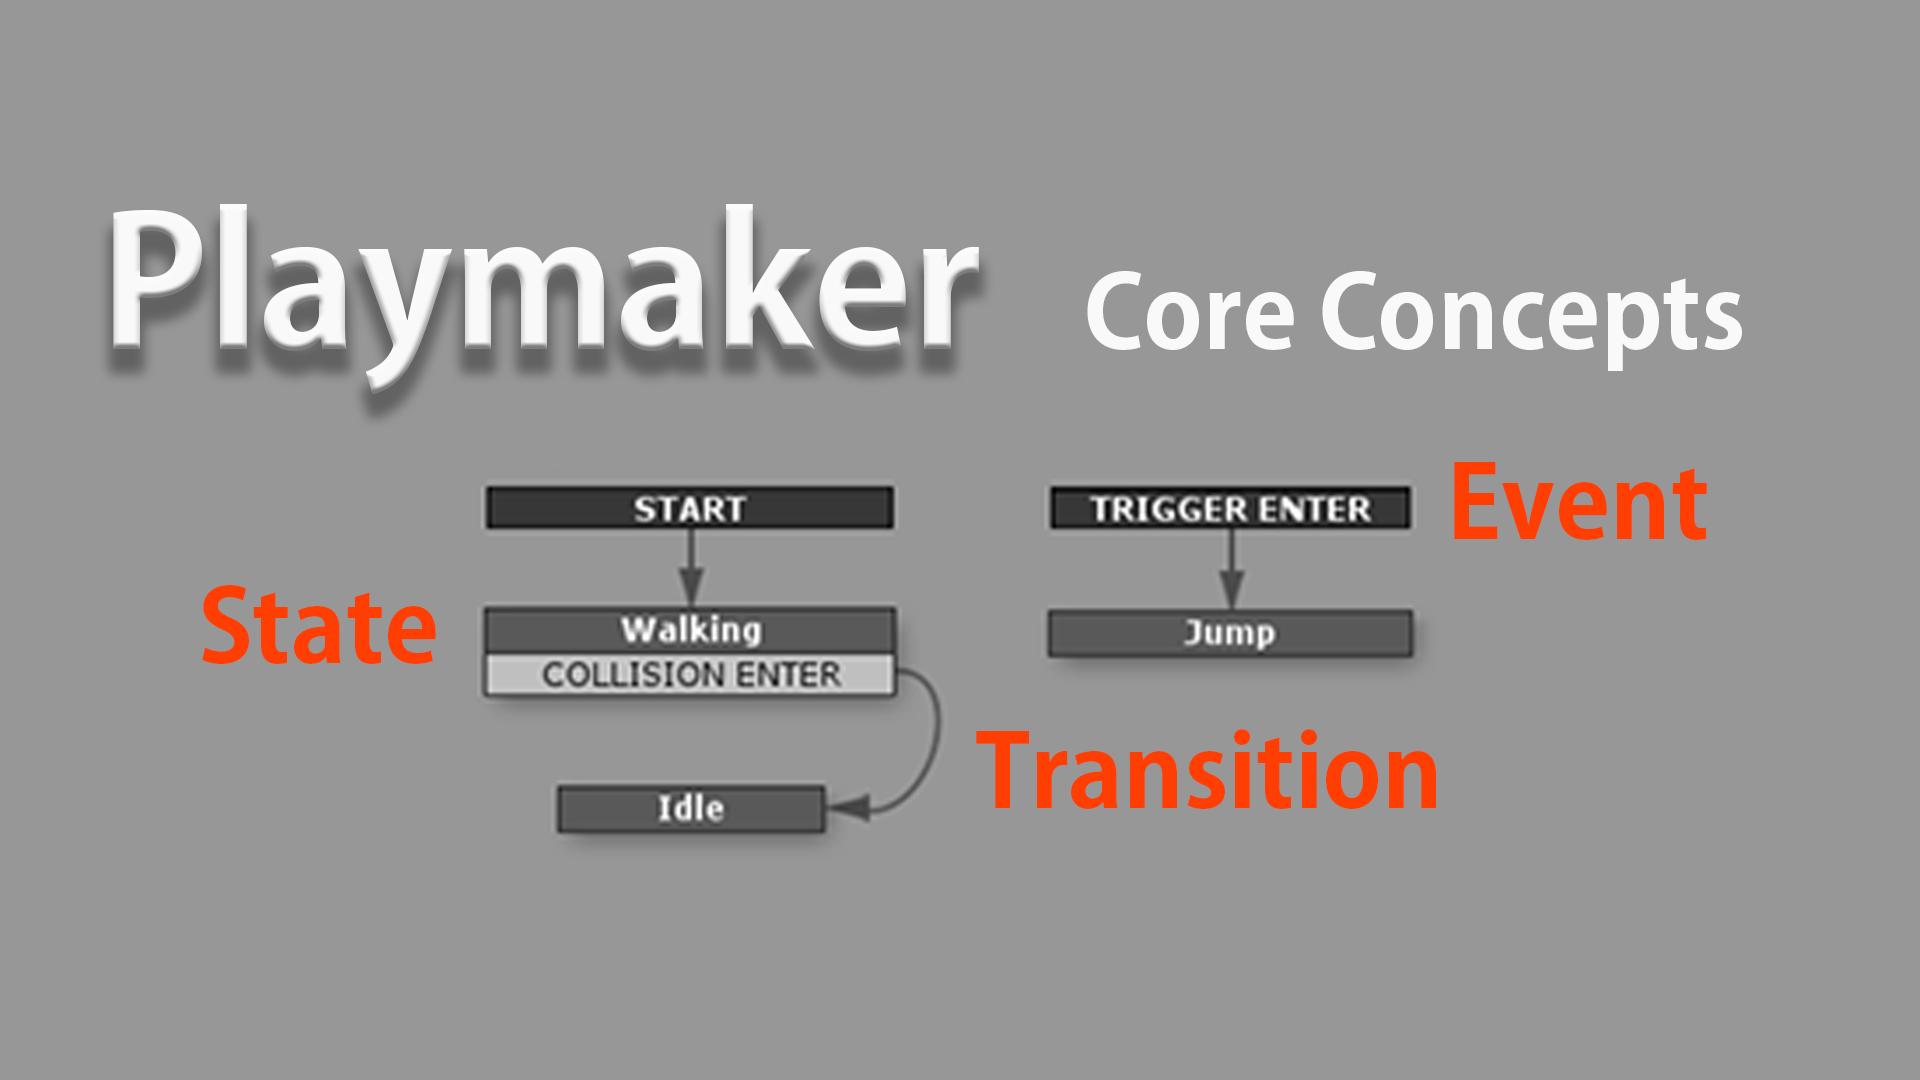 Playmaker Core Concepts